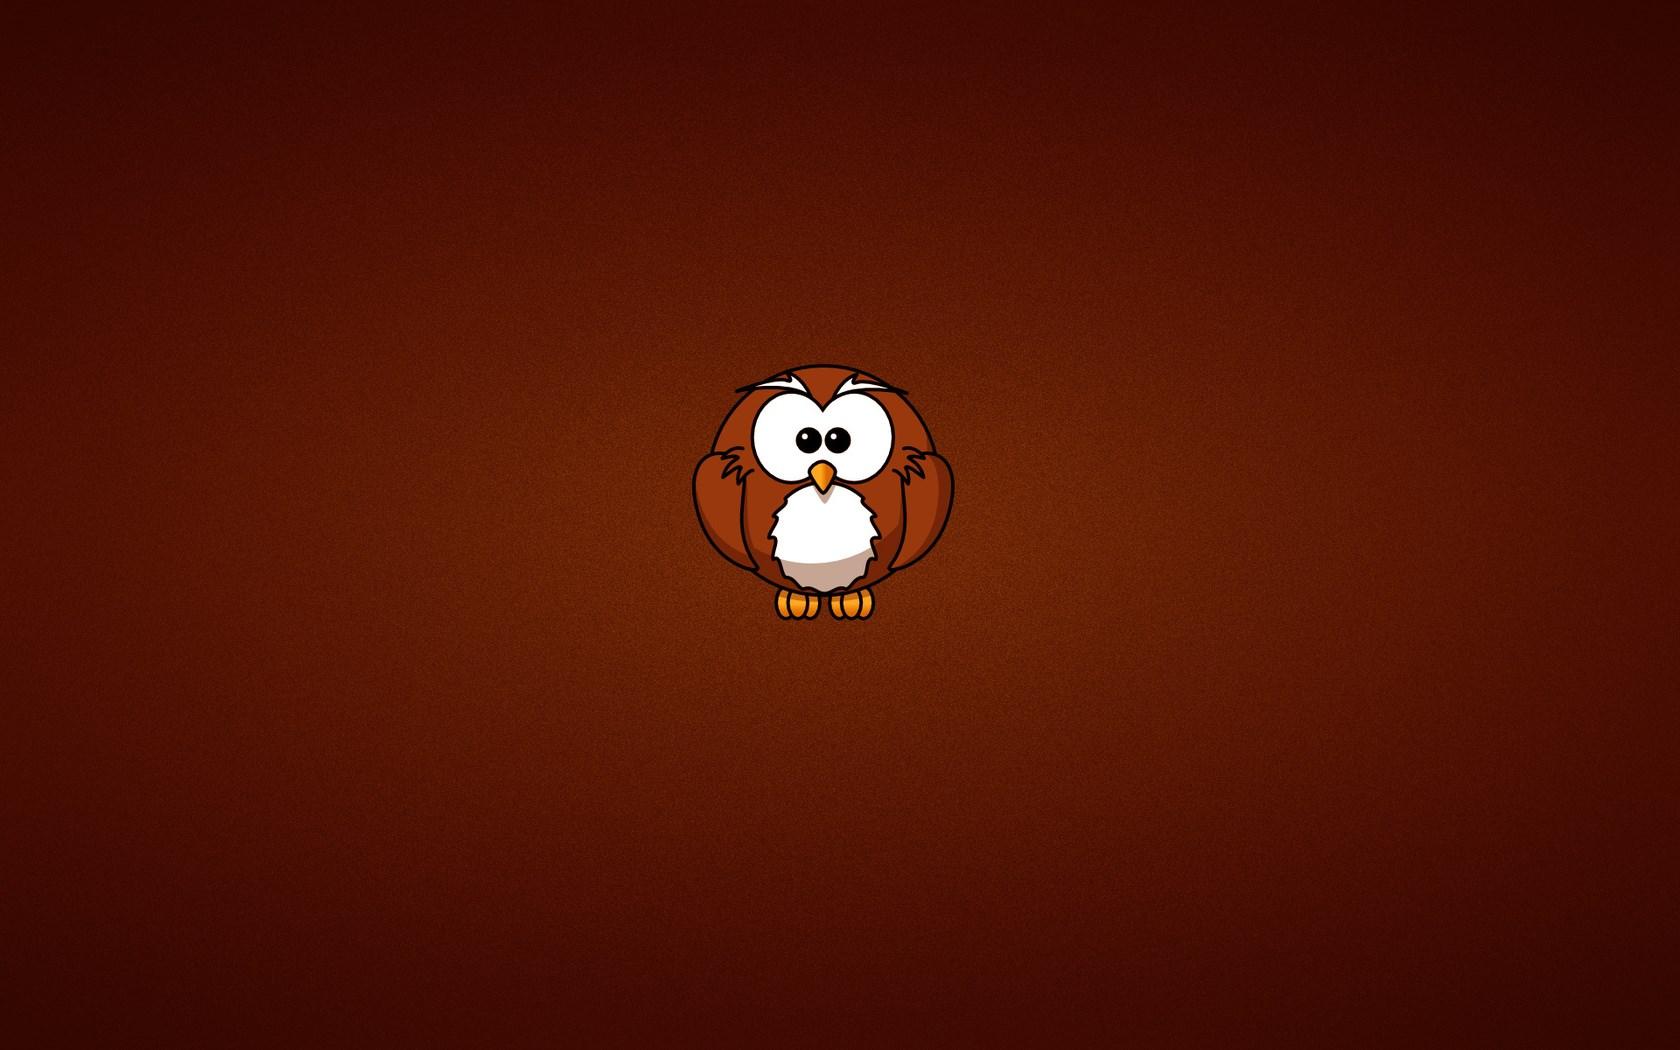 Owl Minimalism Art Cartoon